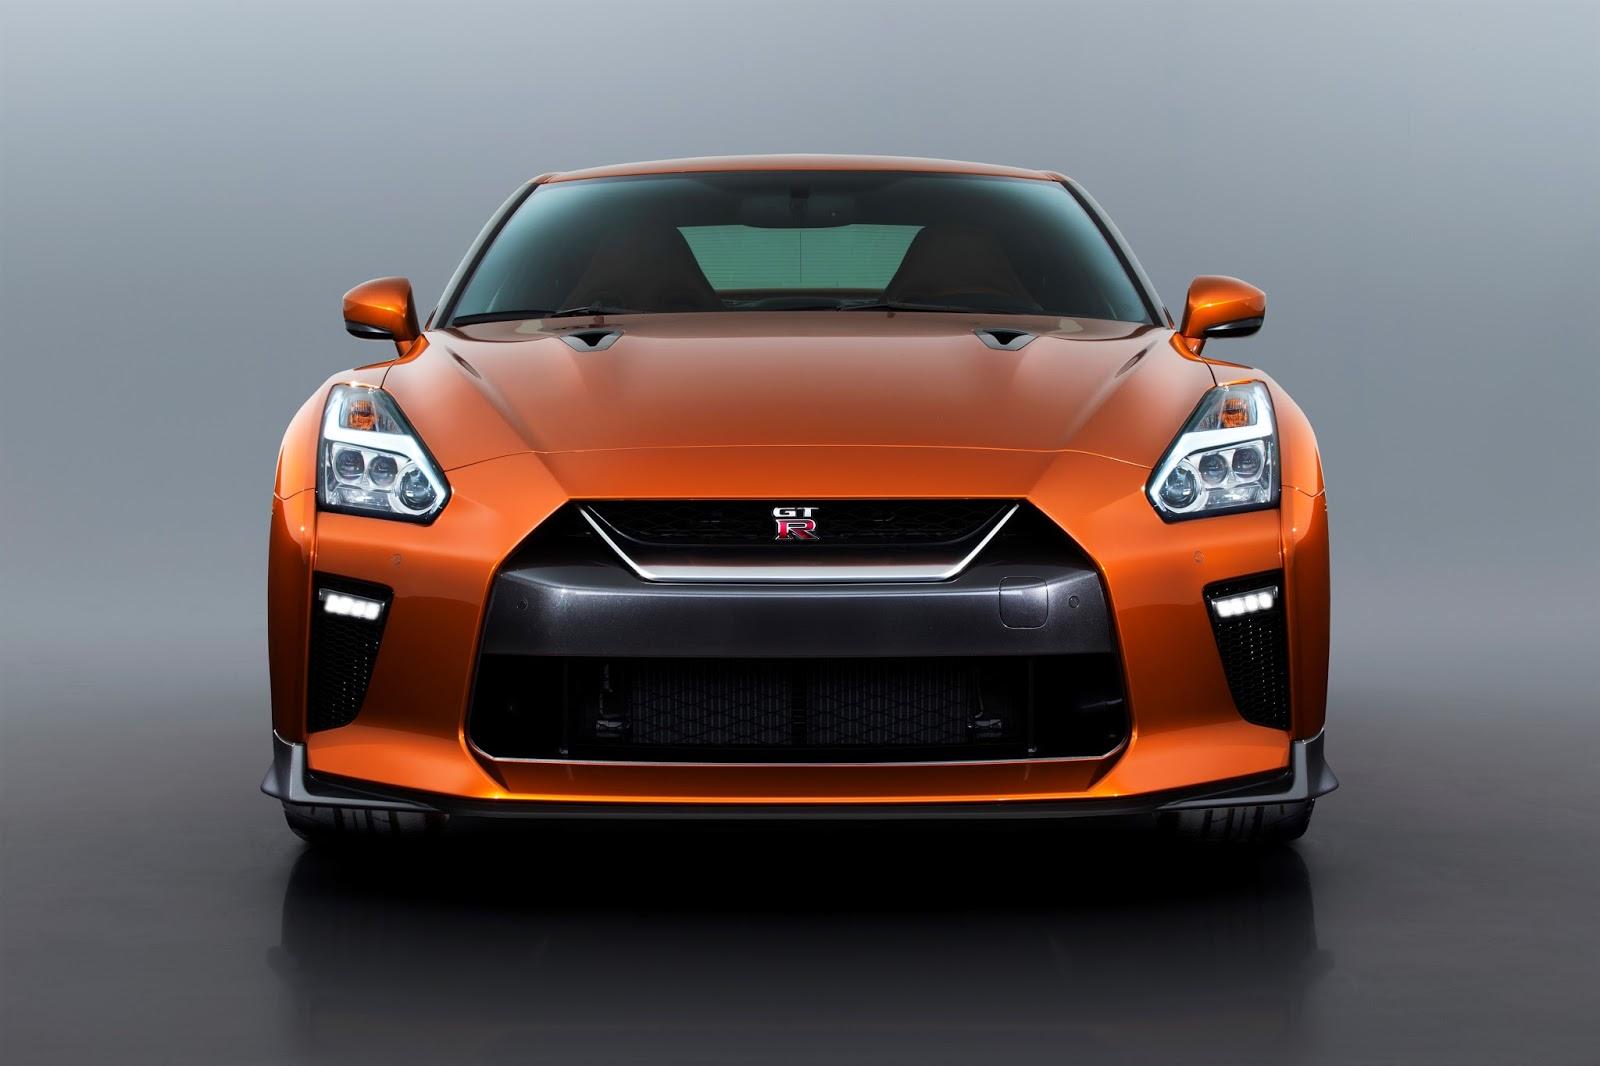 144062 1 5 Nissan GT-R: Ο Godzilla επέστρεψε! Godzilla, Nissan, Nissan GT-R, supercars, έκθεση Νέας Υόρκης